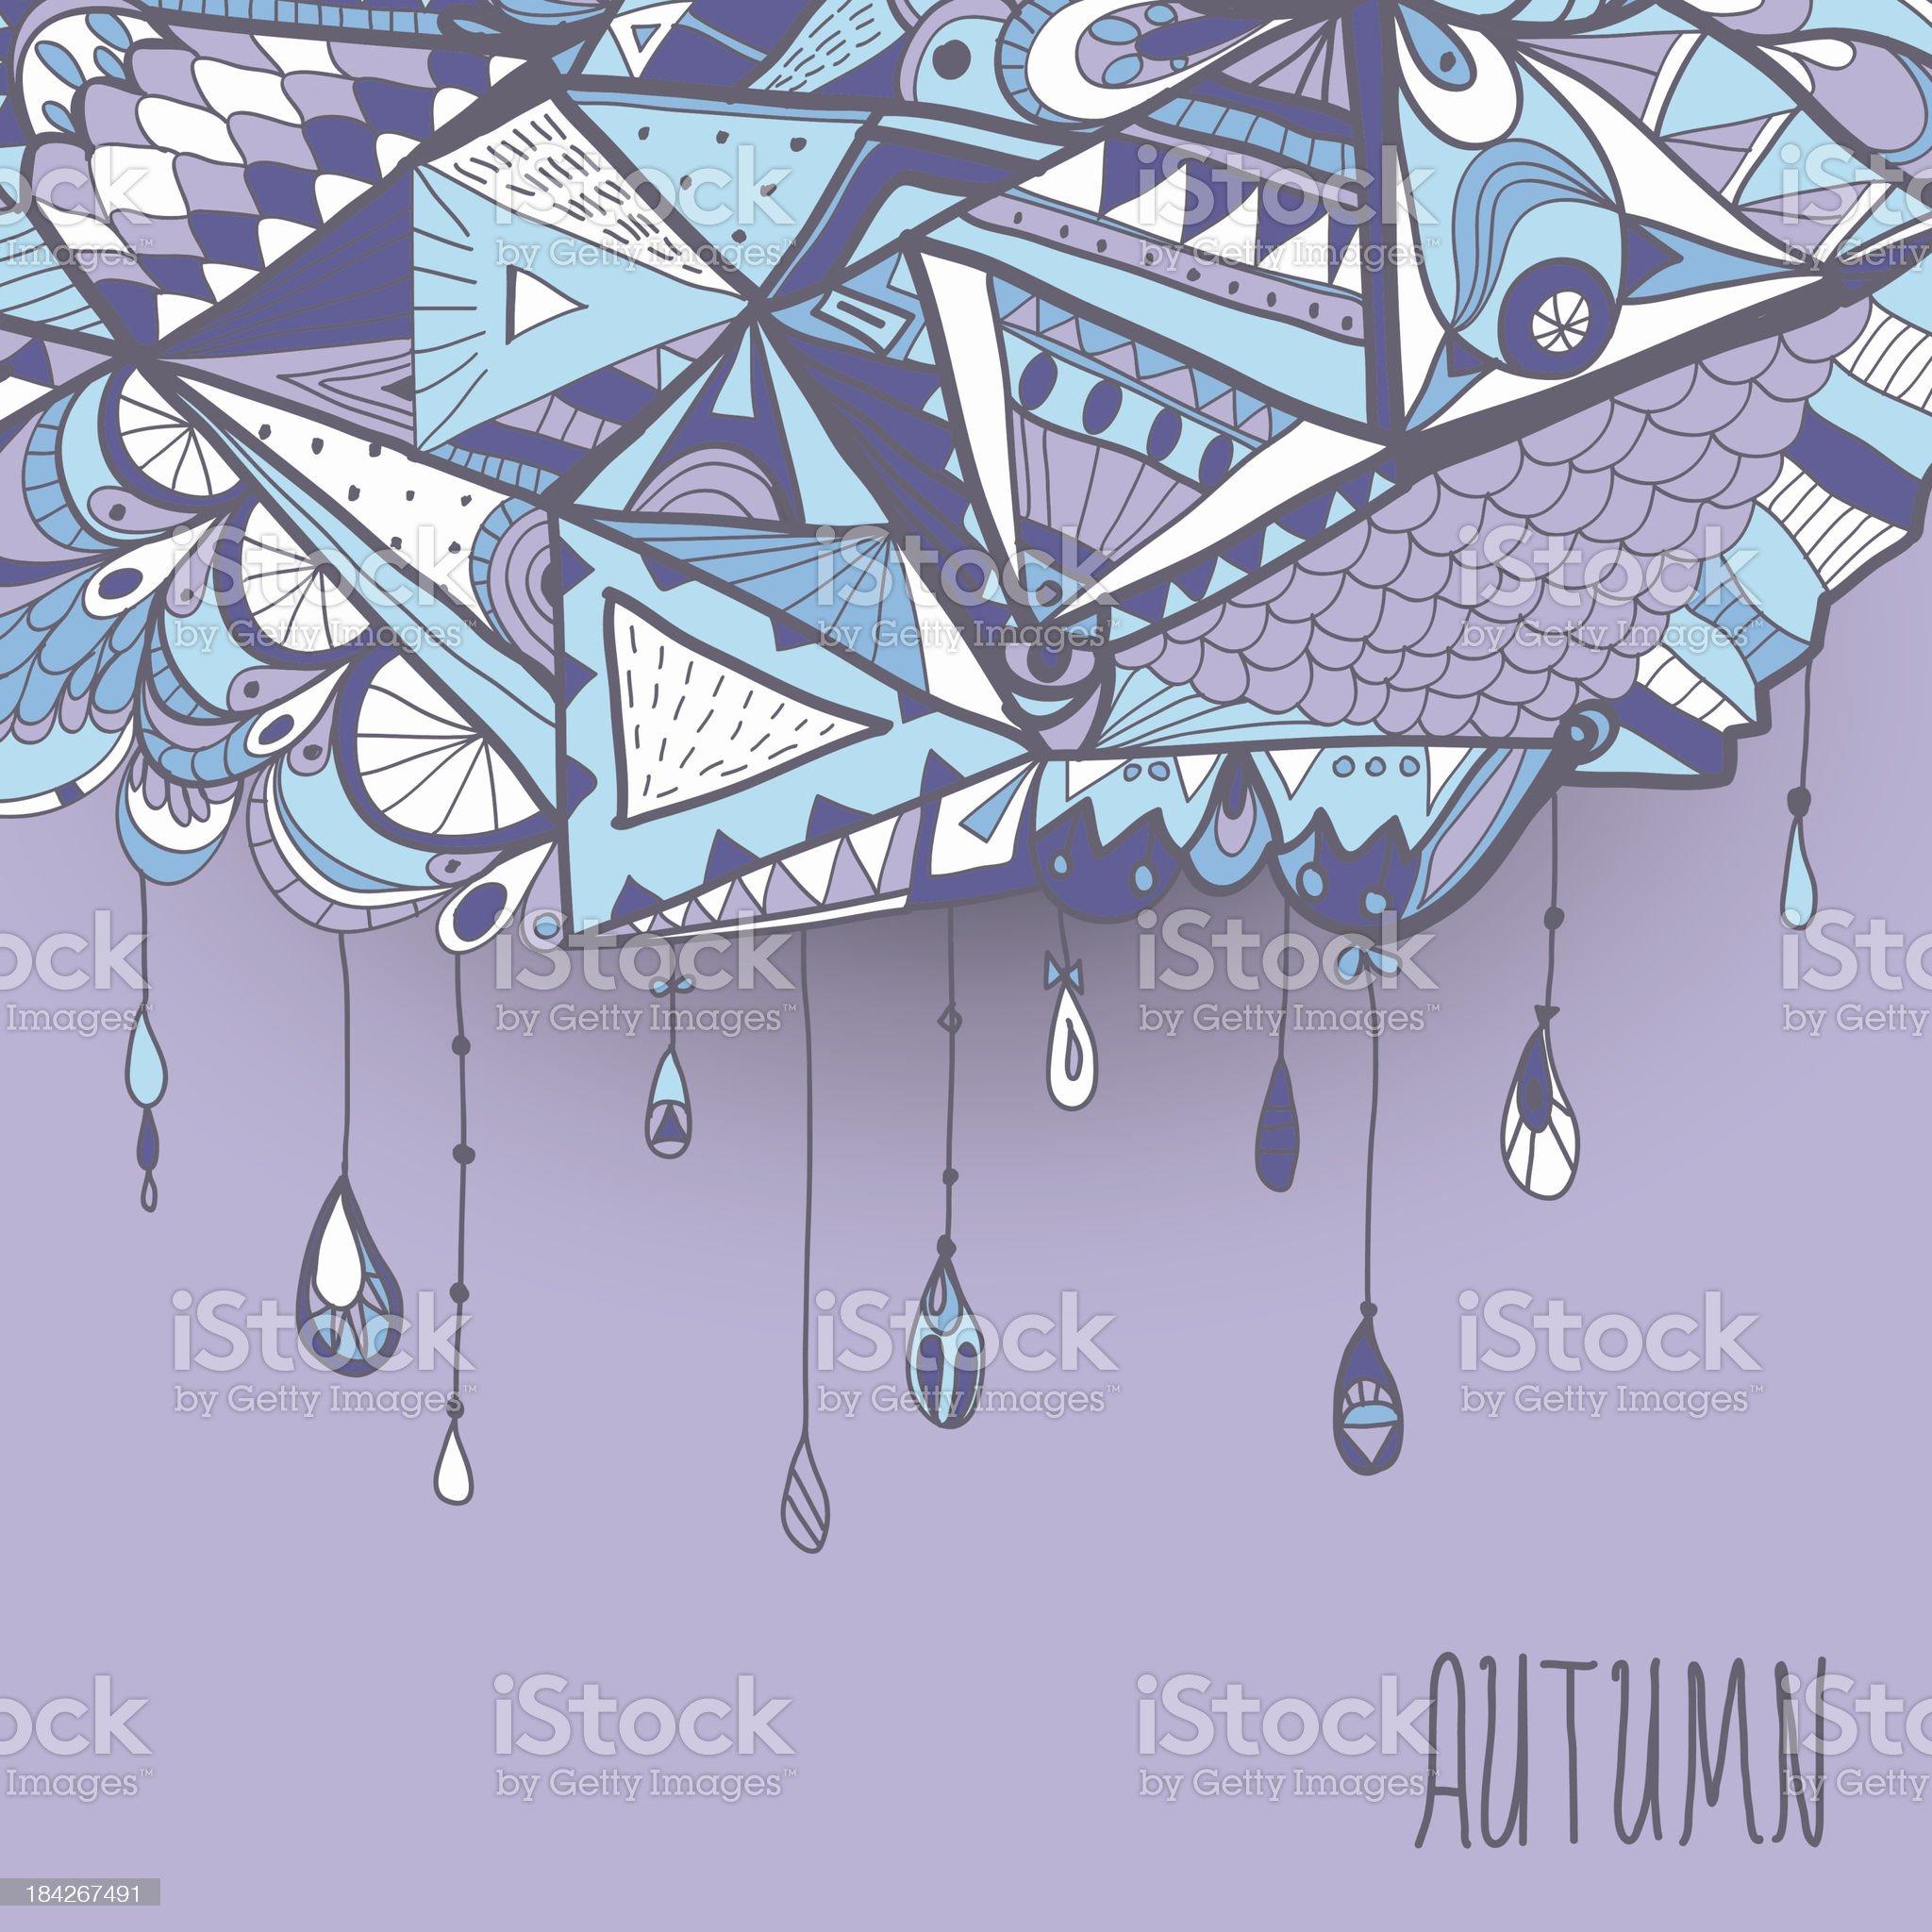 Abstract rain cloud. royalty-free stock vector art